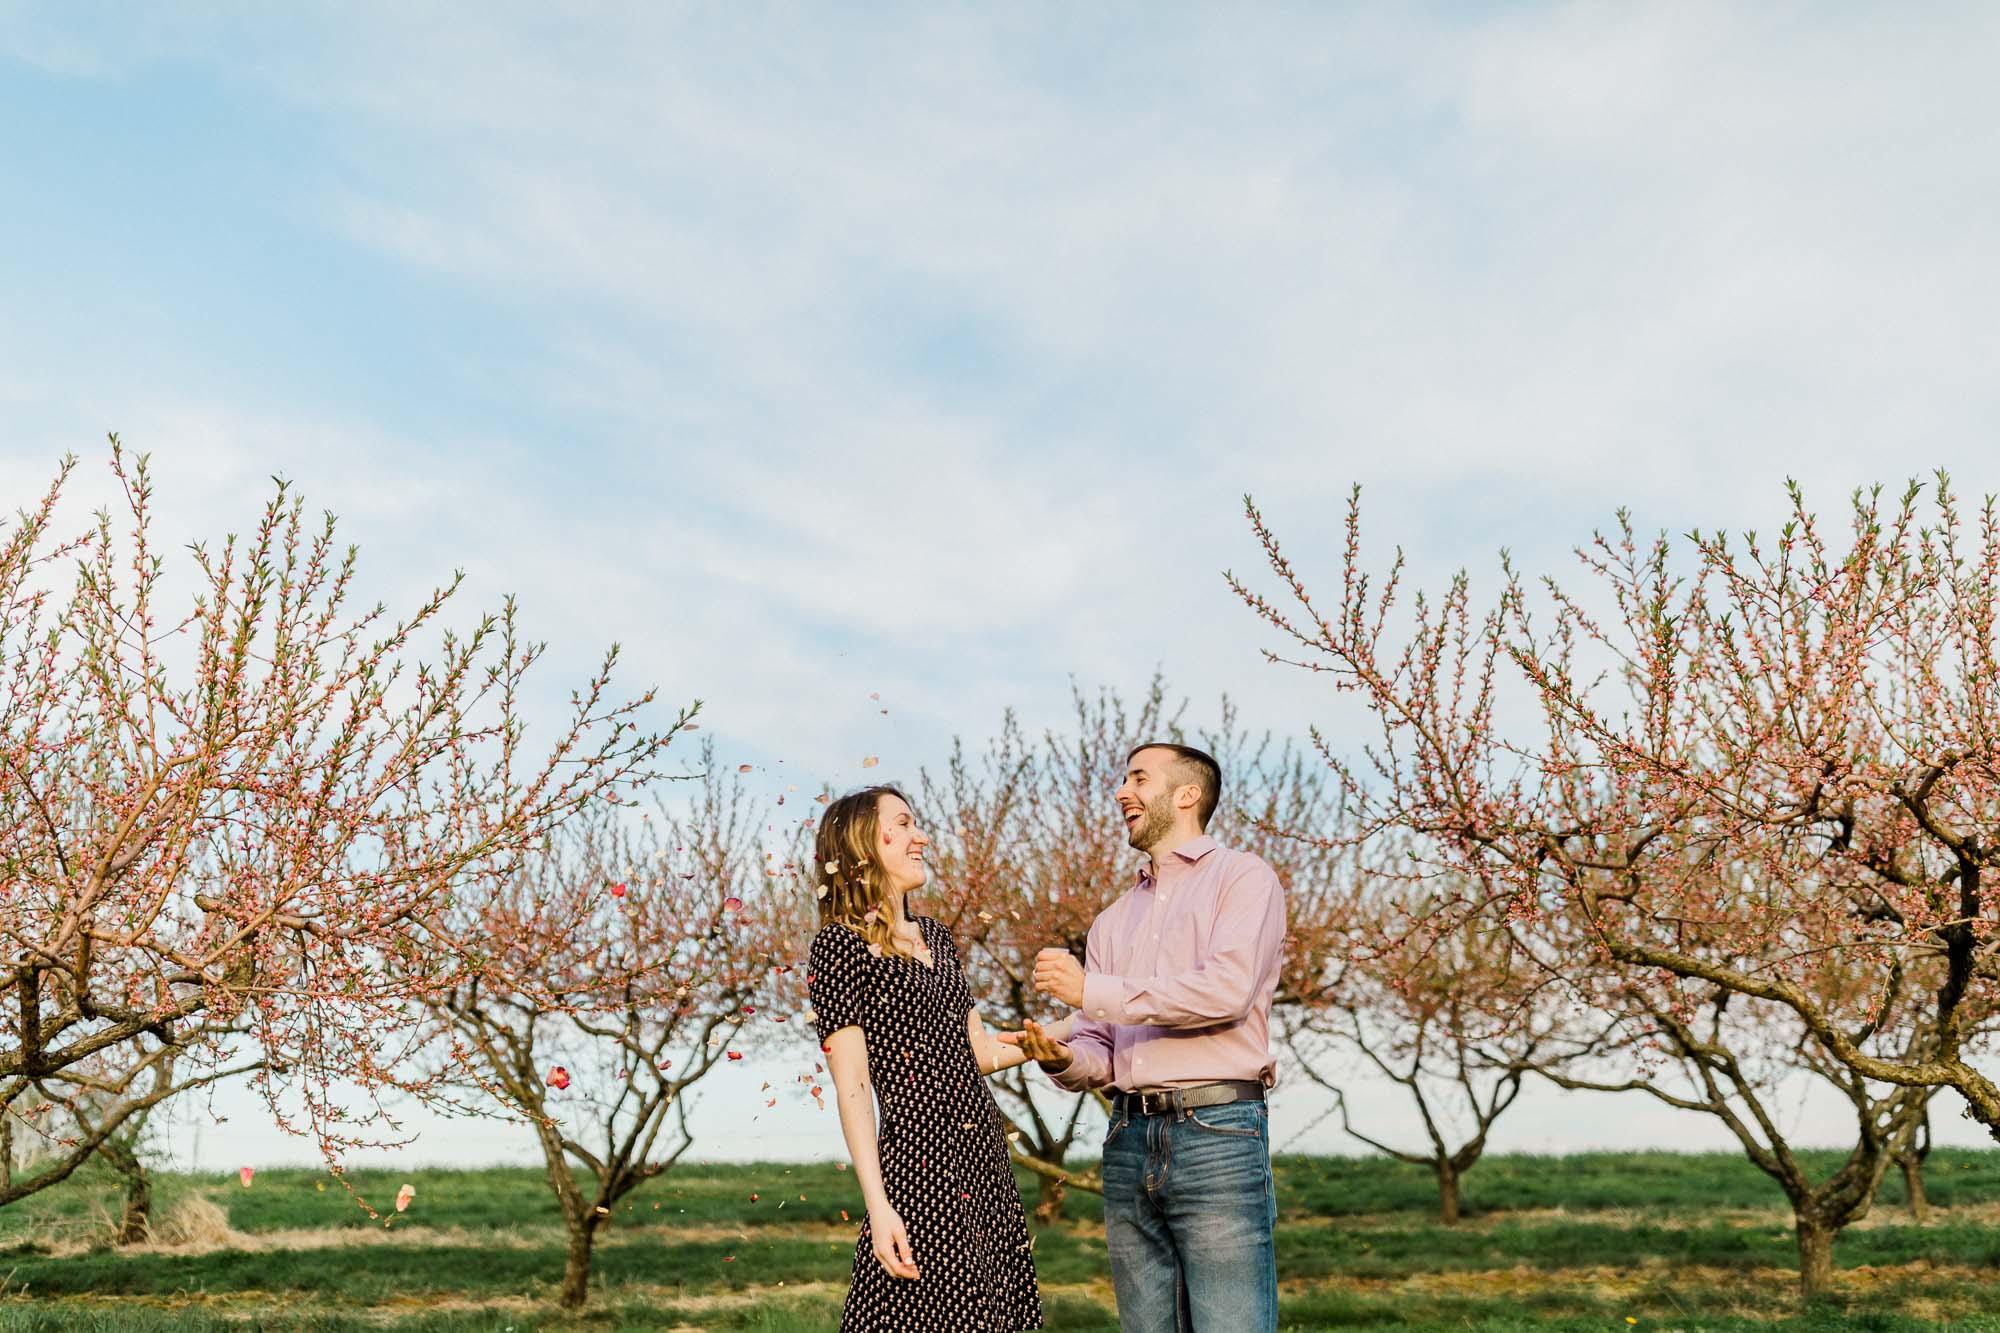 Rohrbachs-Spring-cherry-blossom-engagement-7625.jpg